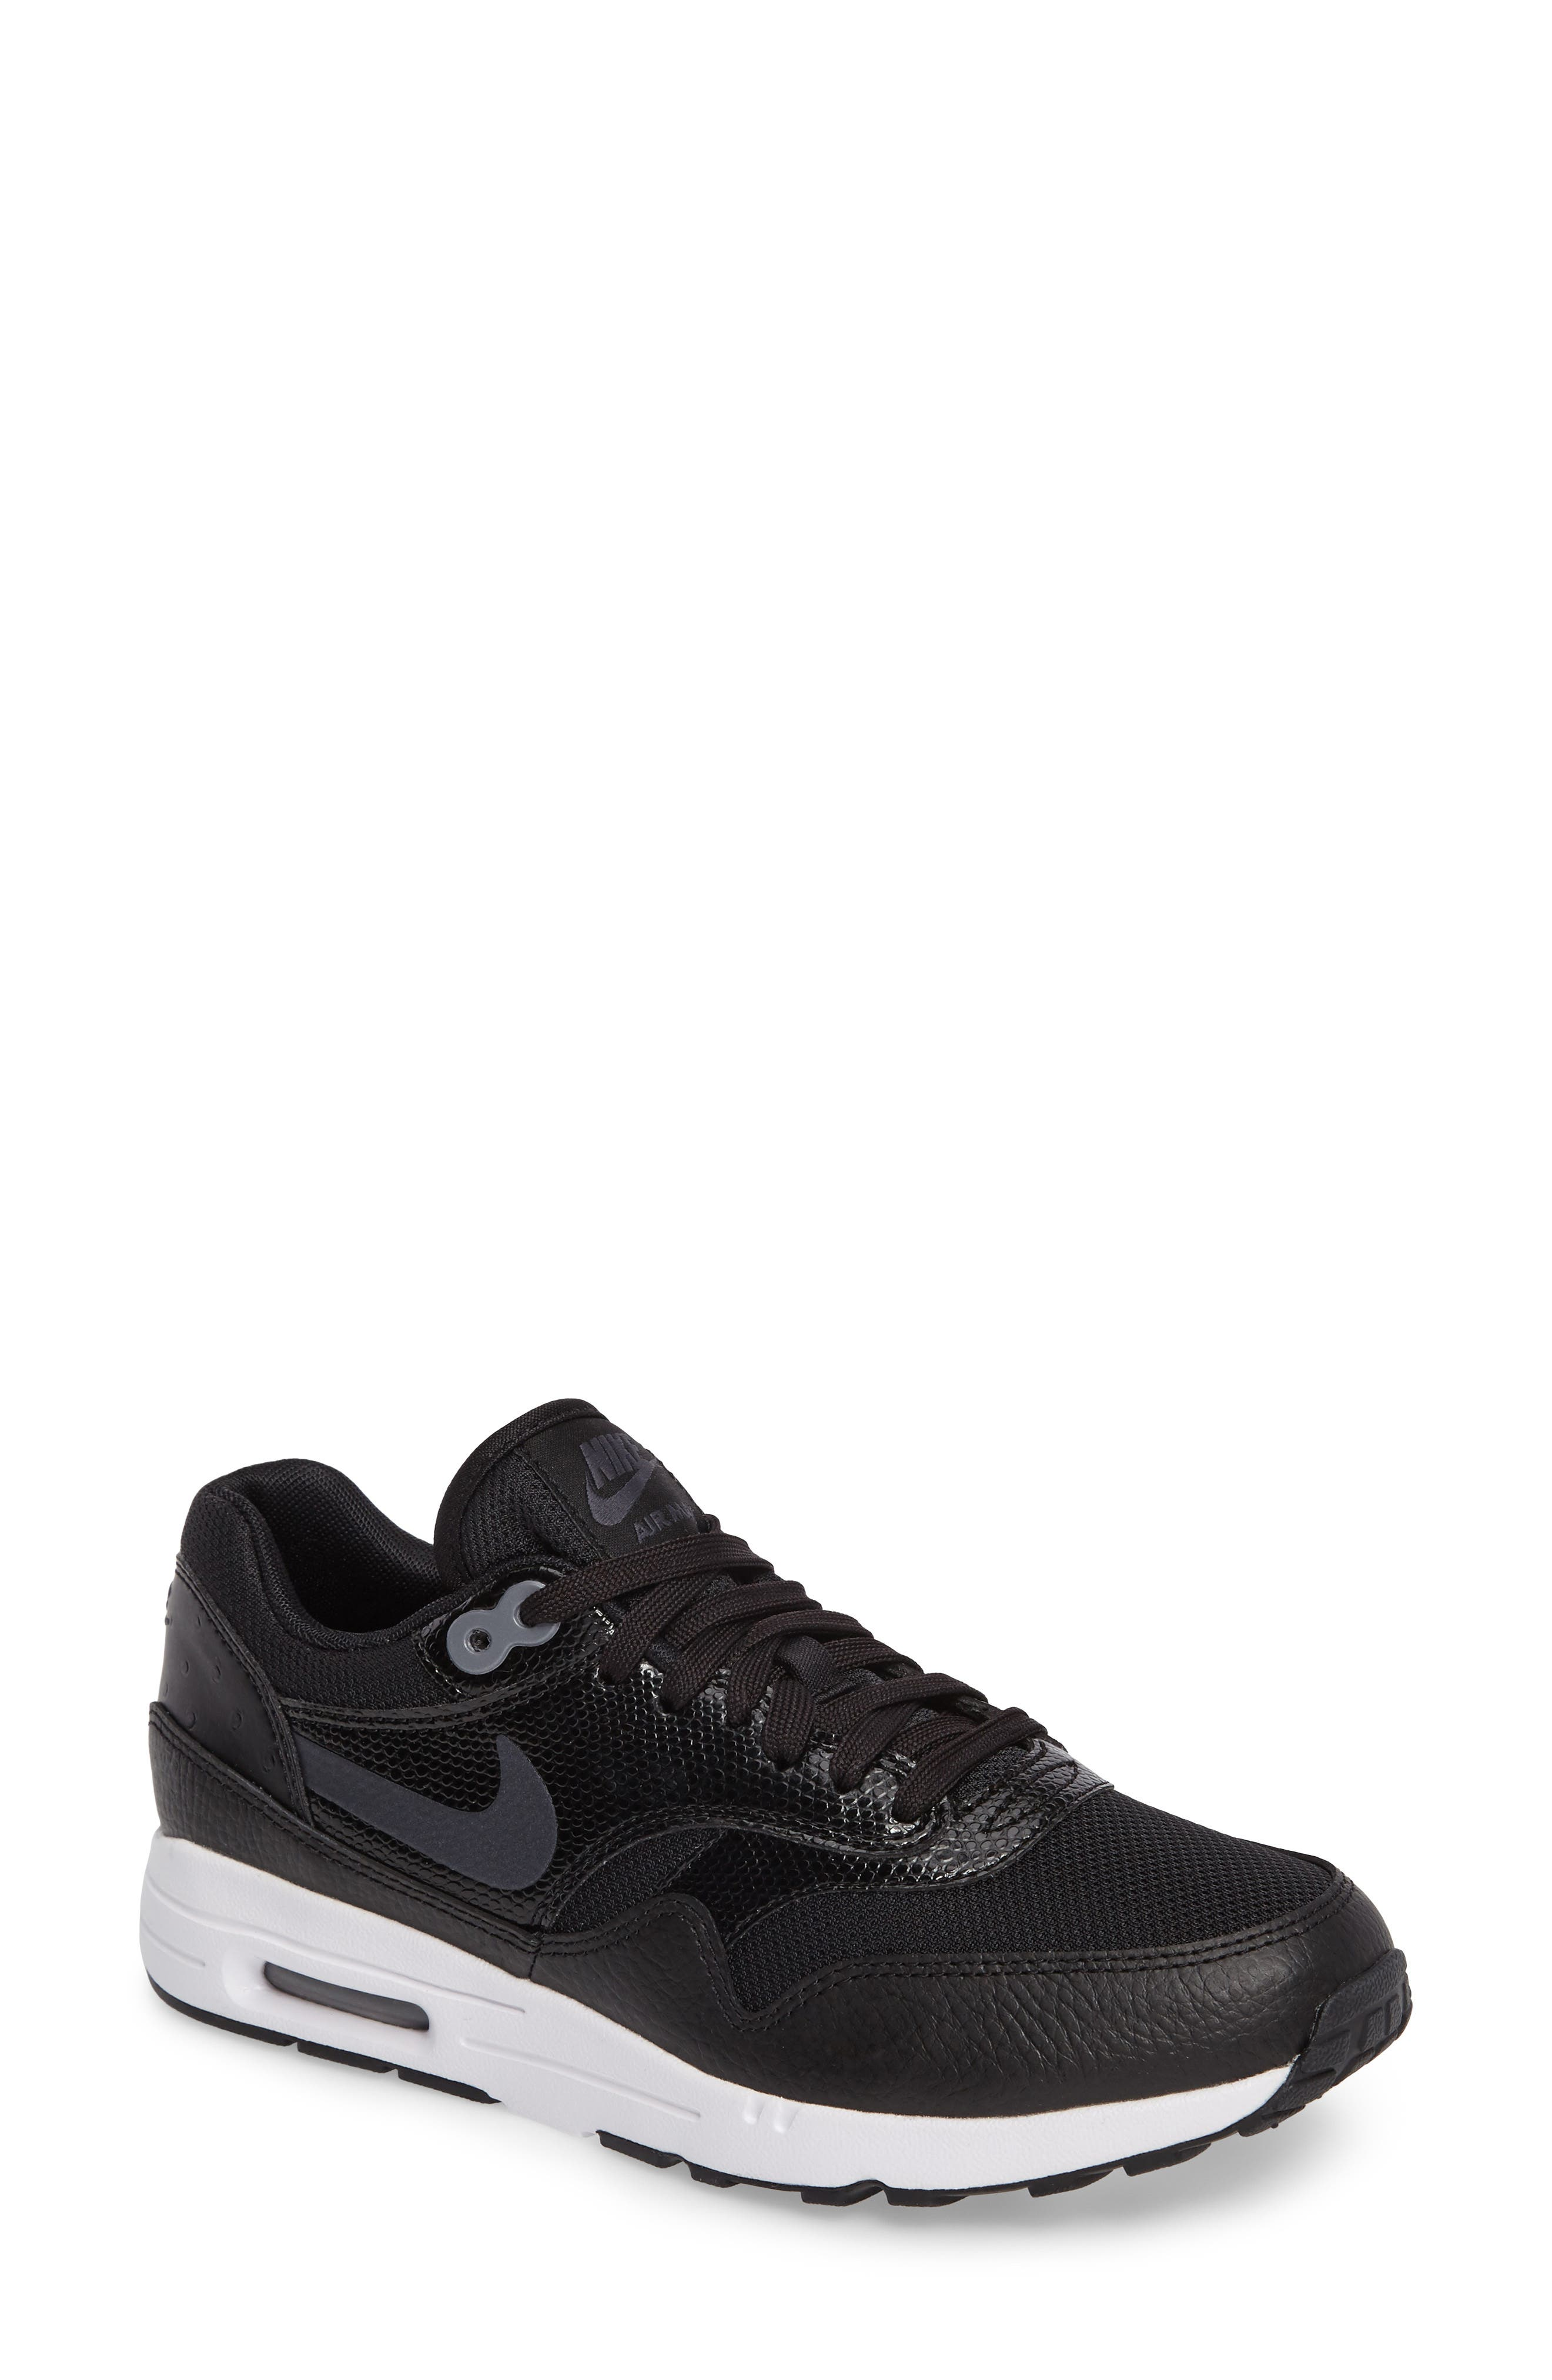 Air Max 1 Ultra 2.0 Running Shoe,                             Main thumbnail 1, color,                             Hematite/ Black/ White